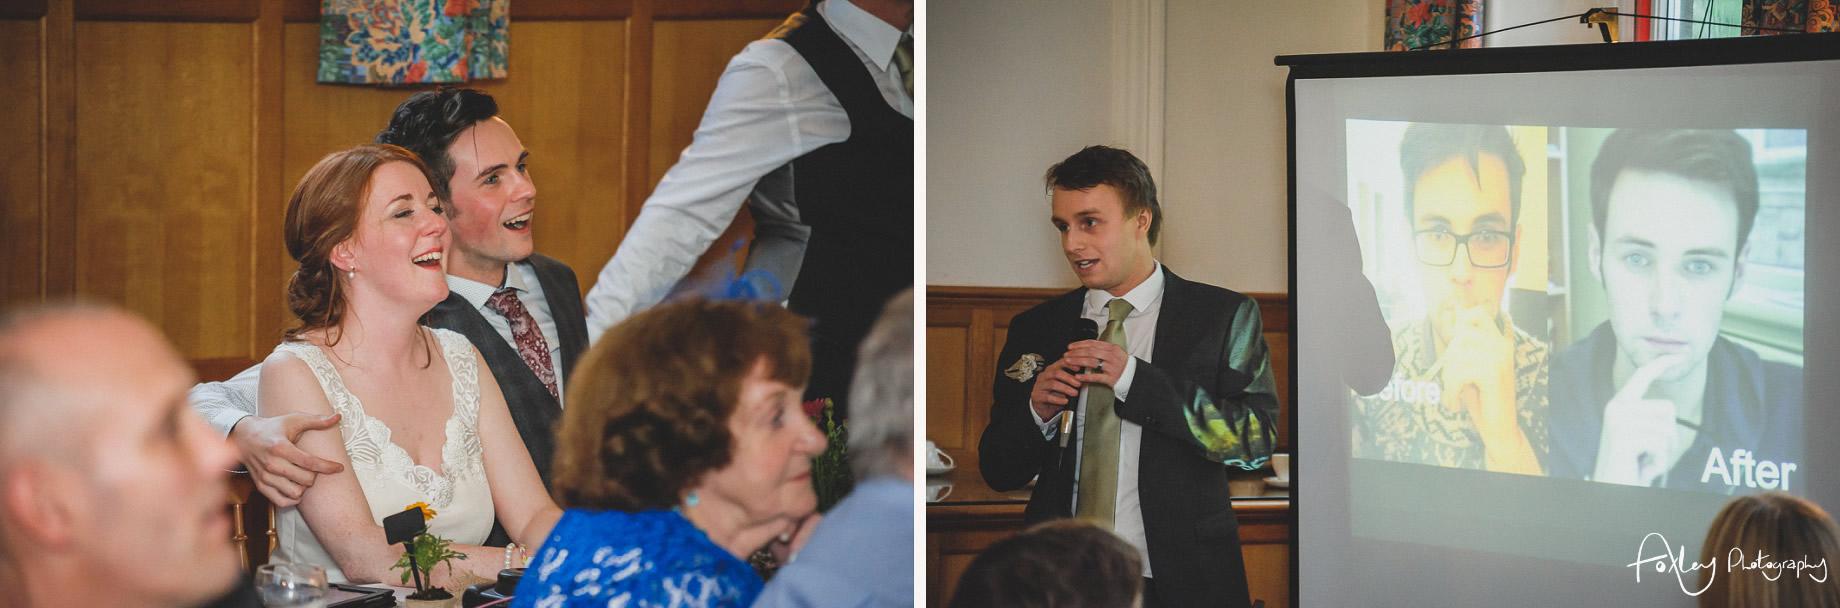 Mel-and-Lewis-Wedding-at-Barley-Village-Hall-160